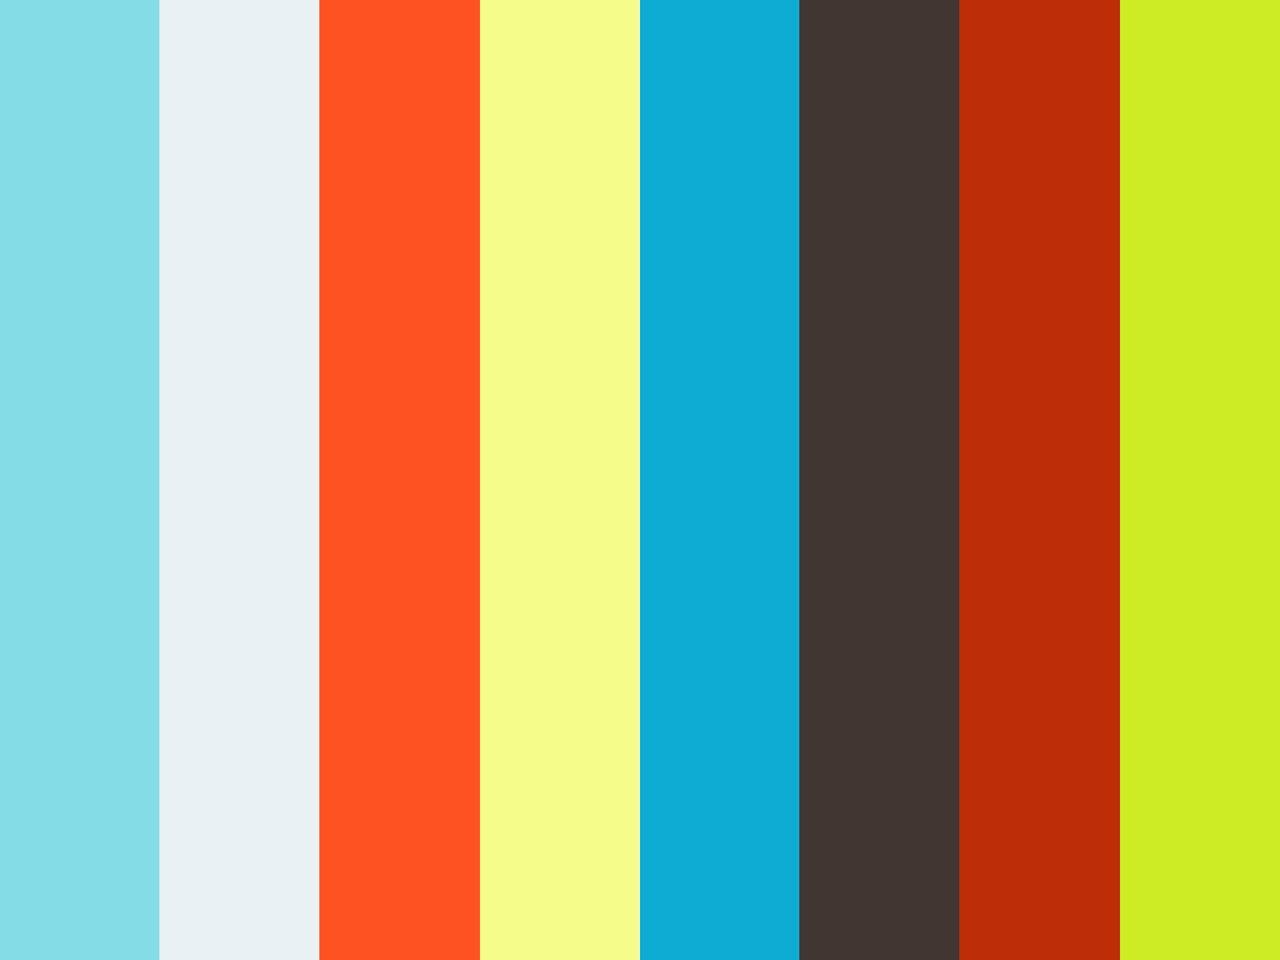 Bud Light - Redemption [720p]